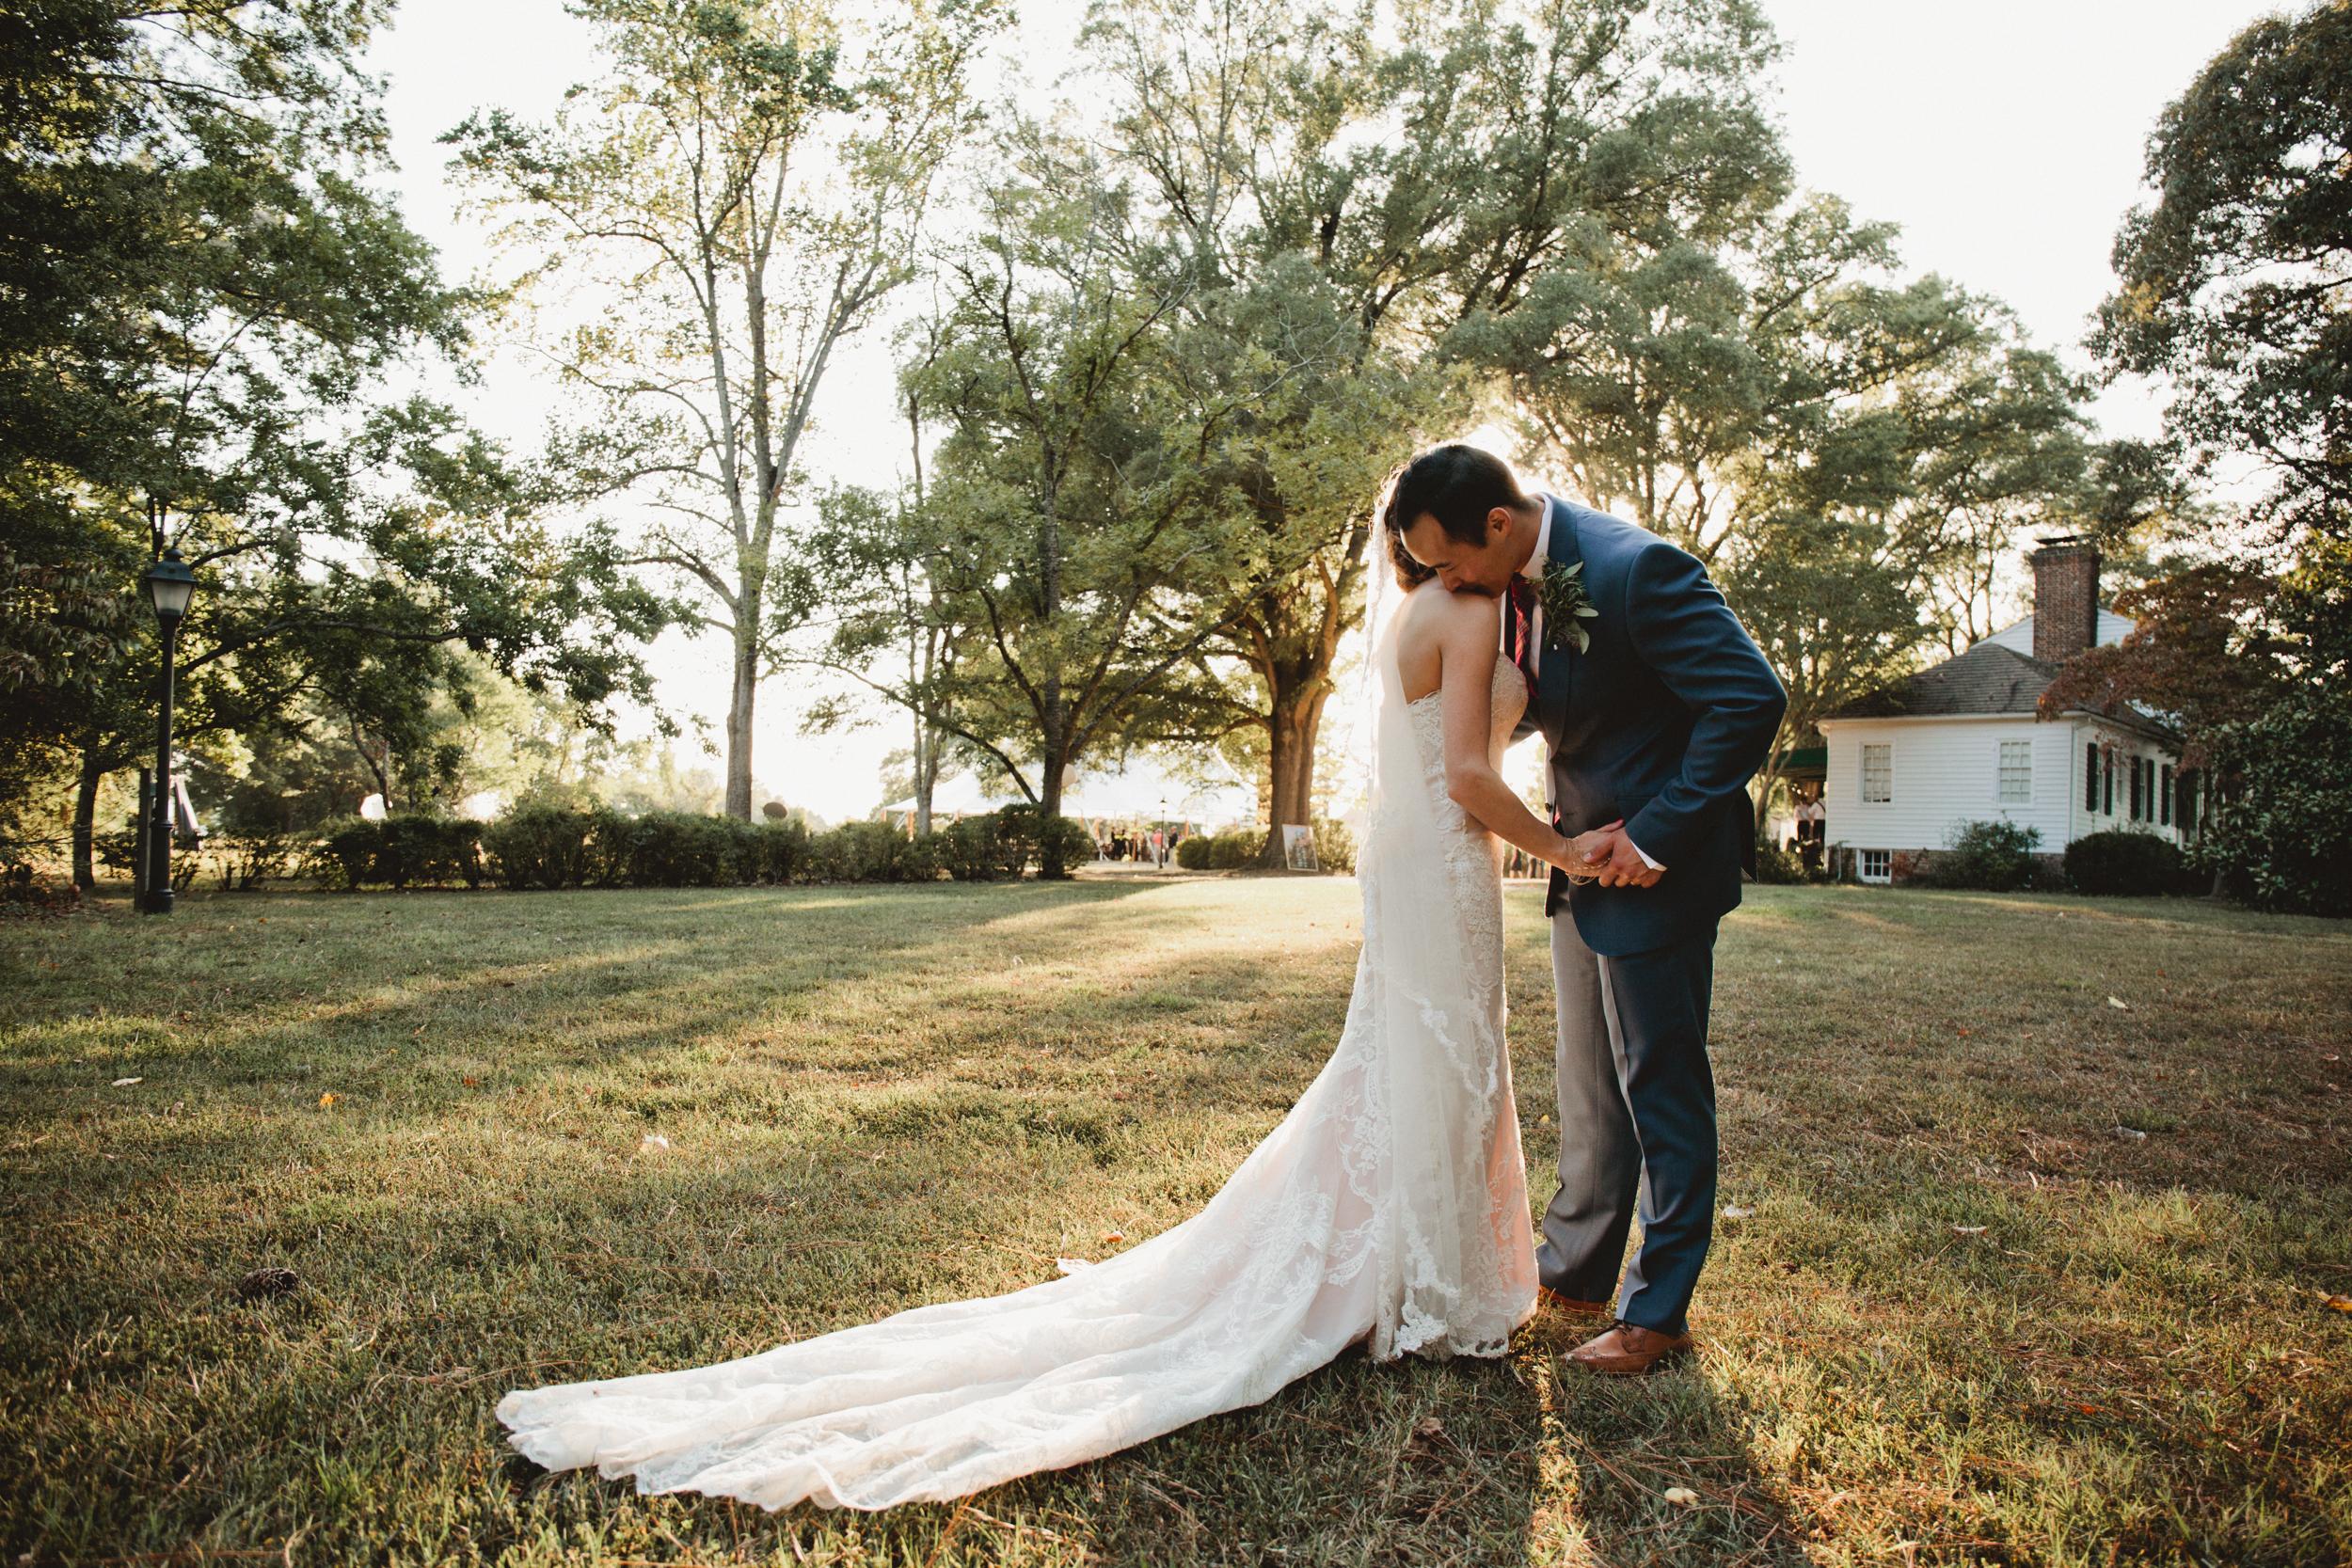 Maine-Wedding-Photographer-1061.jpg